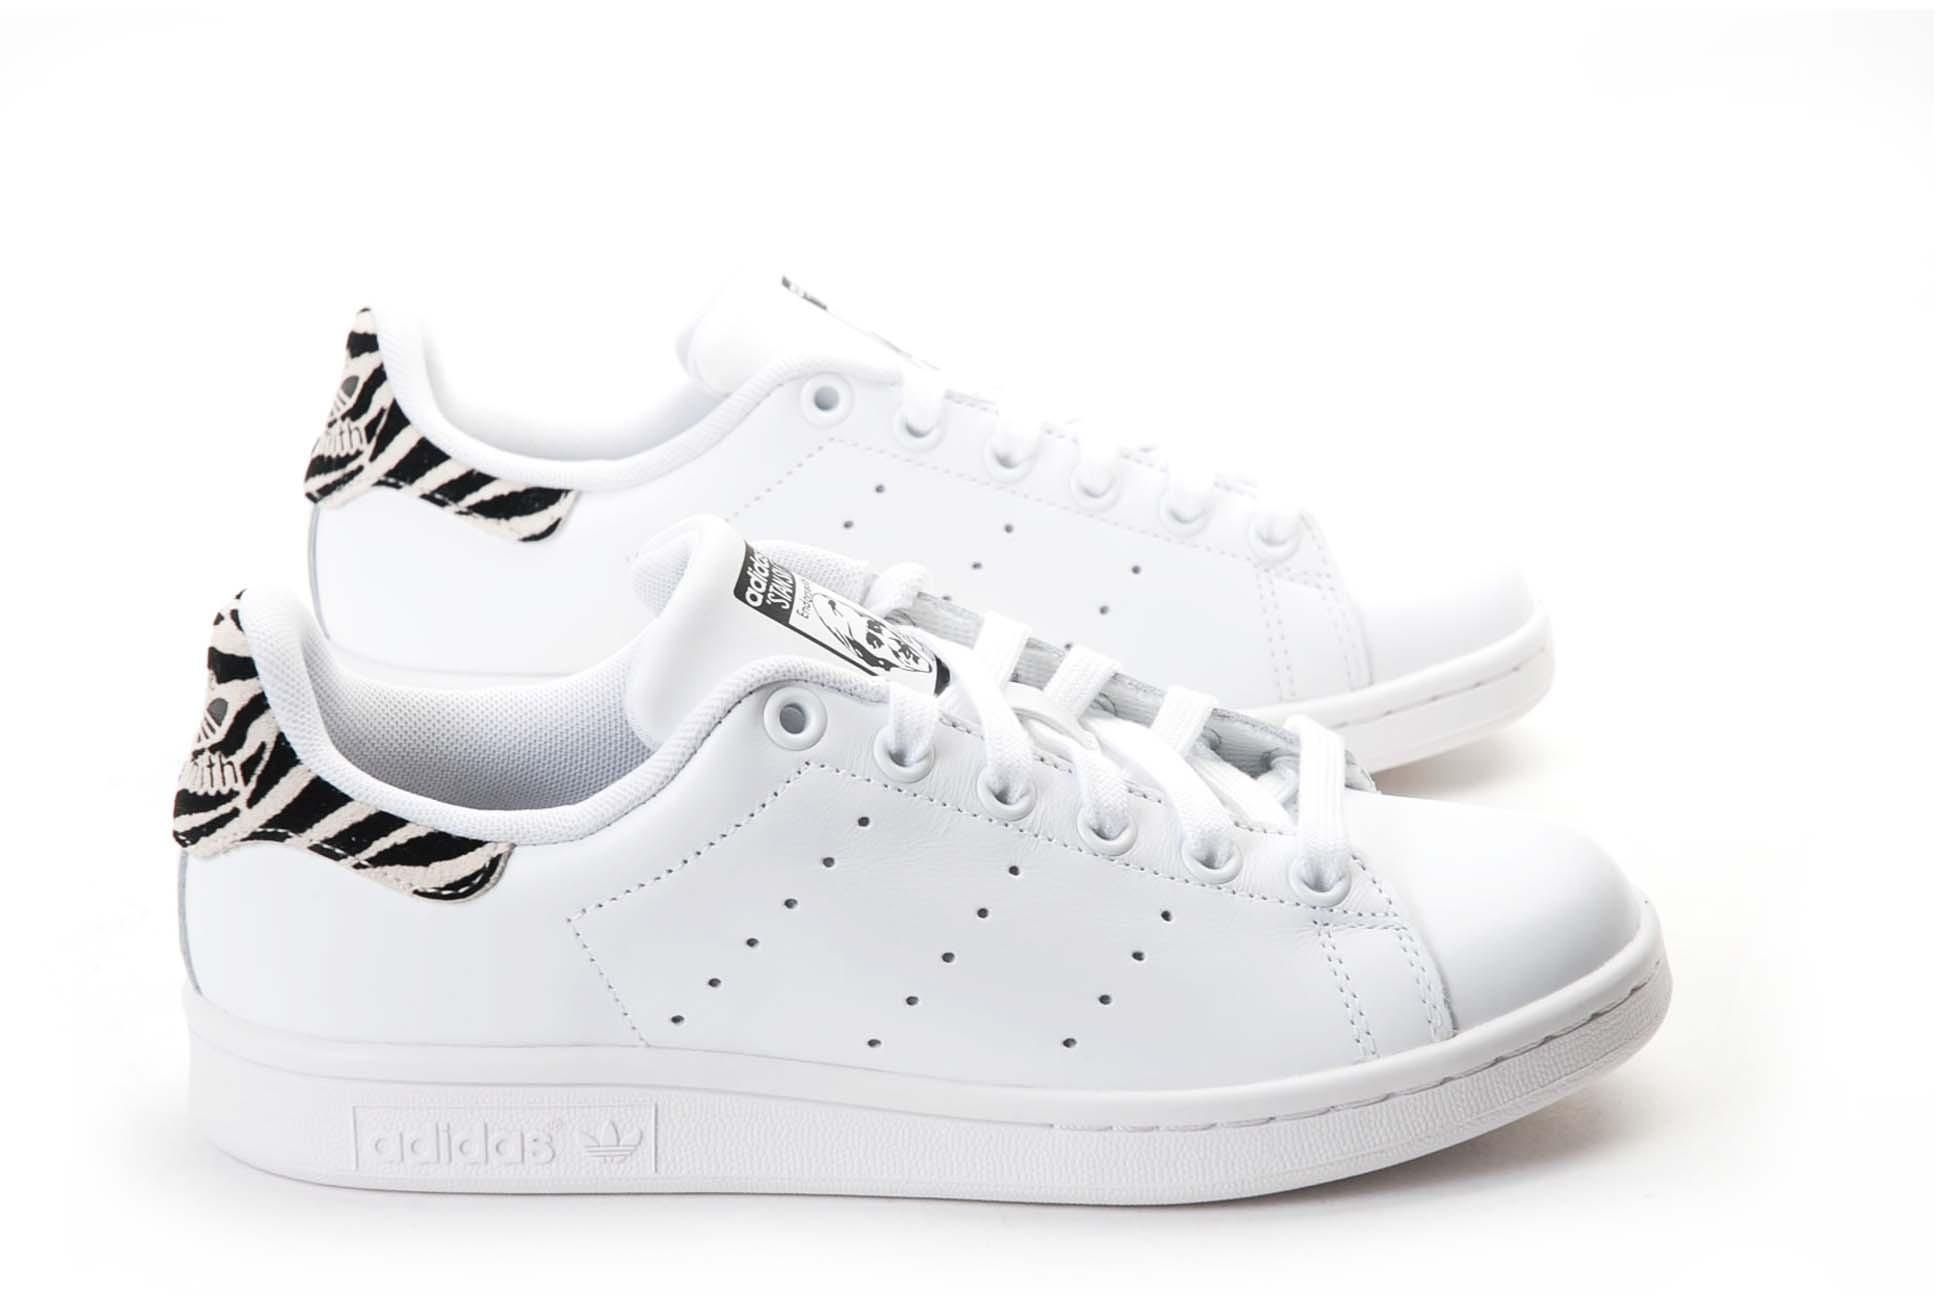 adidas stan smith zebra pas cher,adidas stan smith zebre femme